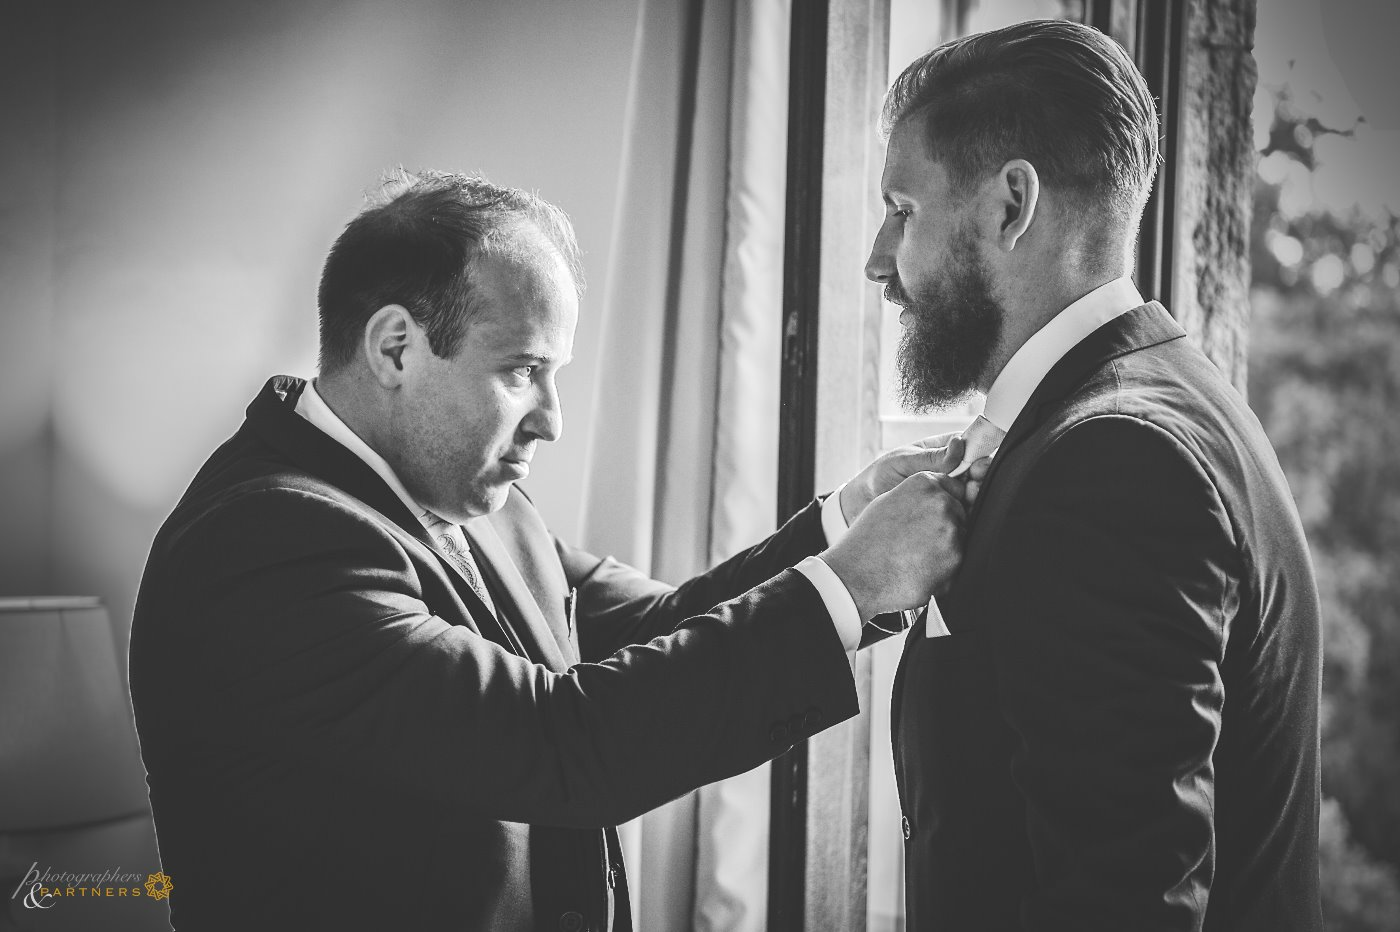 photos_weddings_castello_oliveto_02.jpg